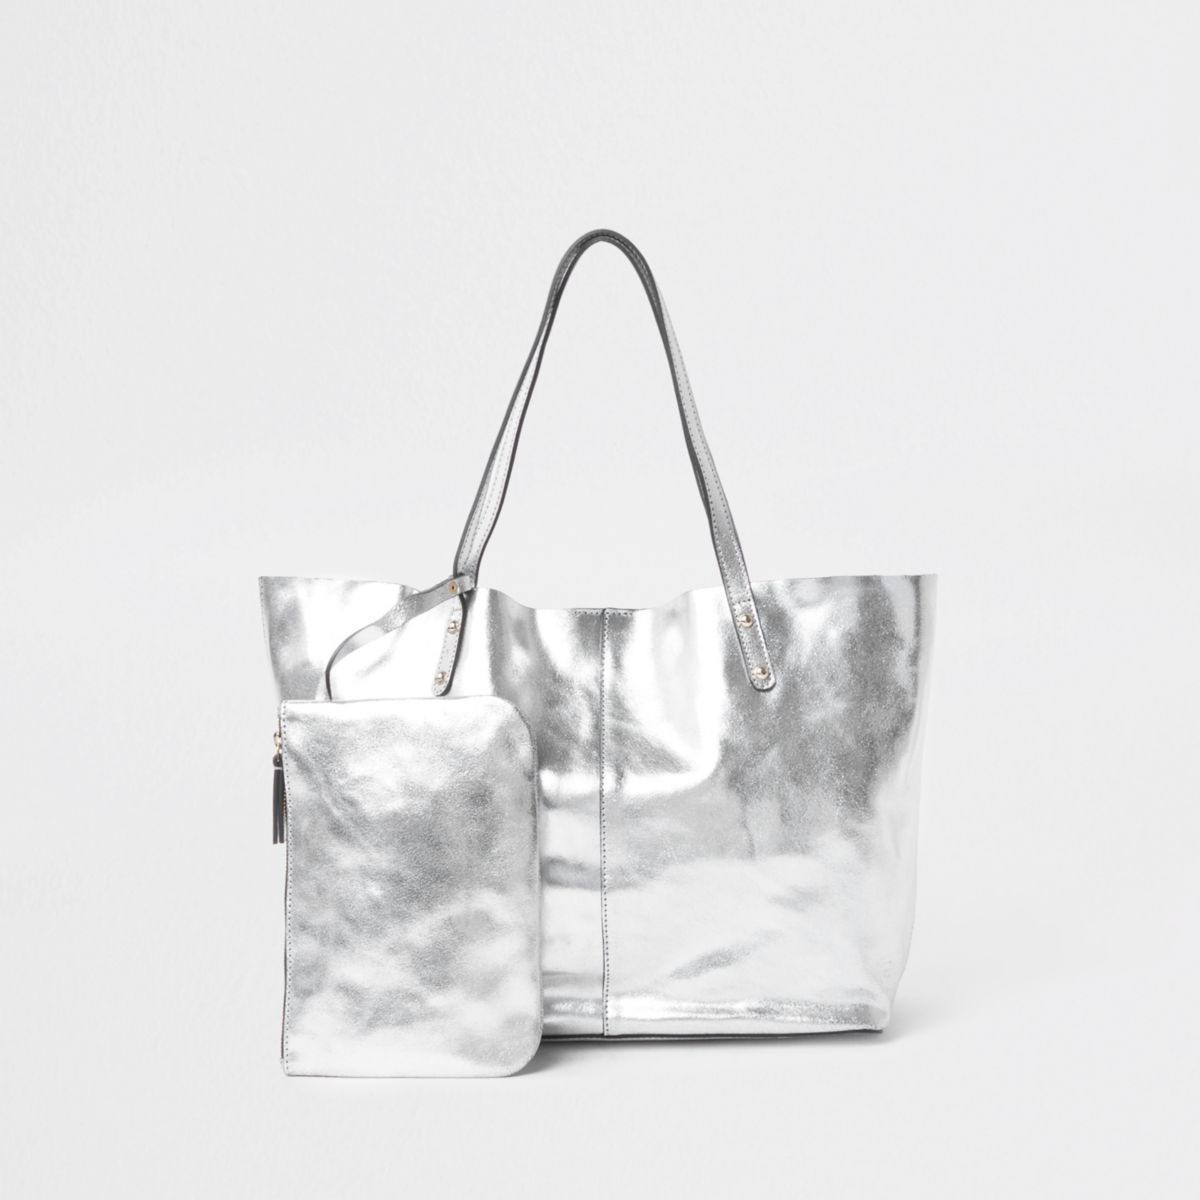 Silver leather metallic shopper tote bag